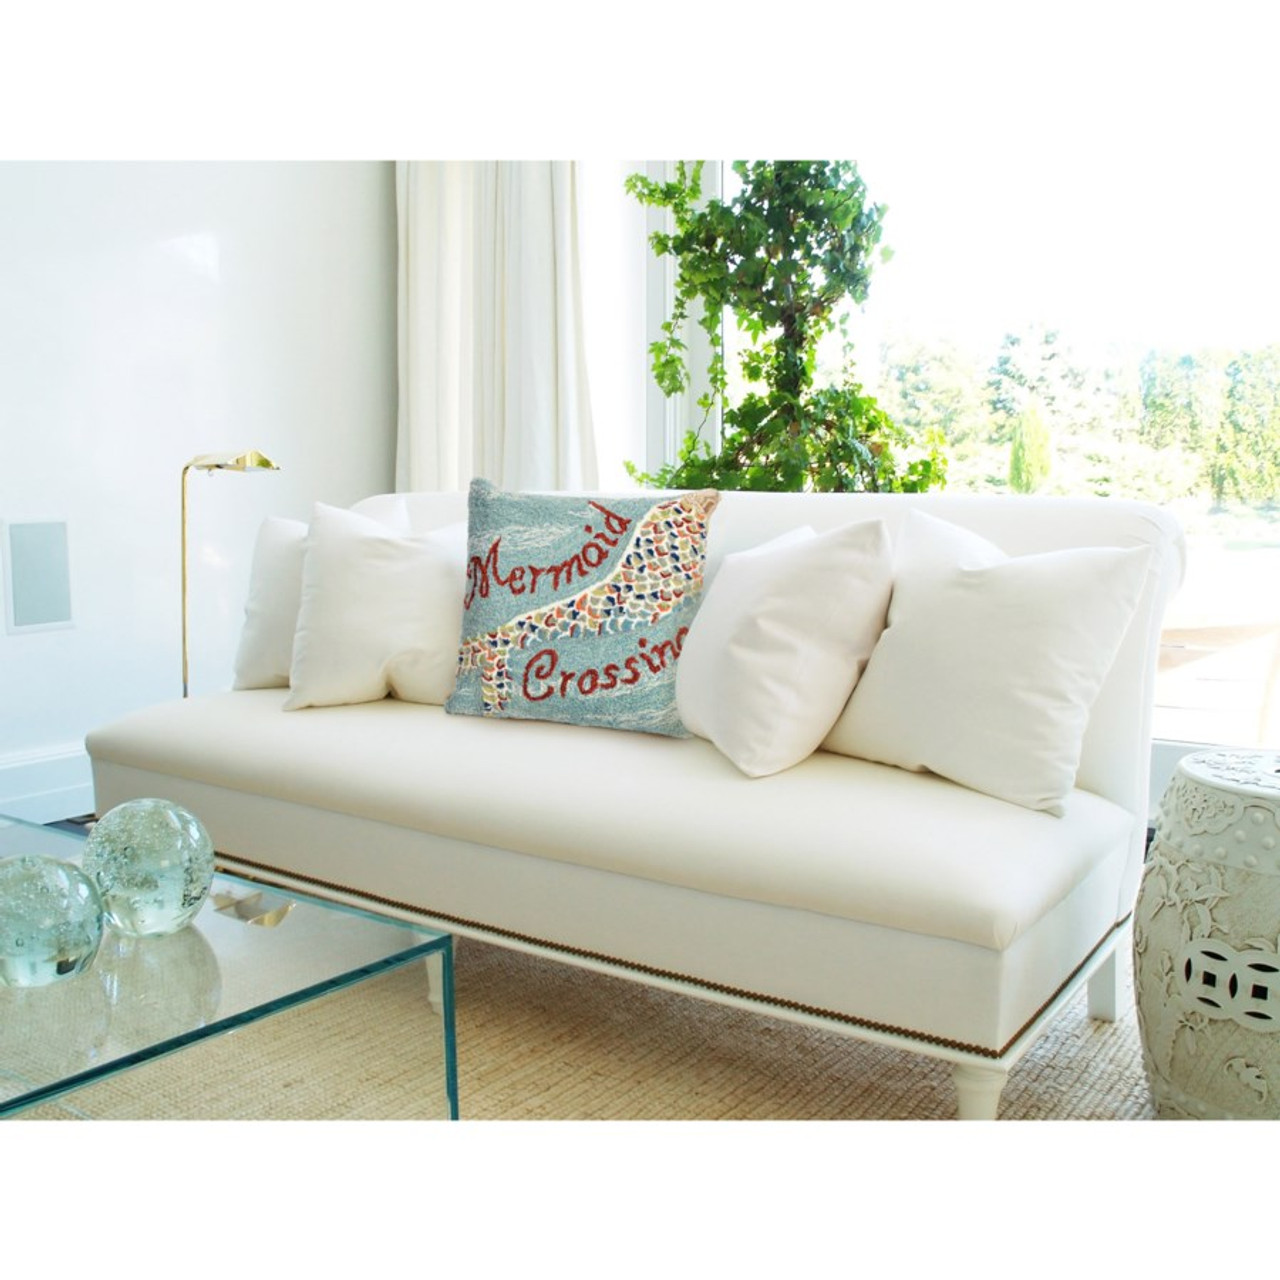 "Frontporch ""Mermaid Crossing"" Indoor/Outdoor Throw Pillow - Lifestyle 2"